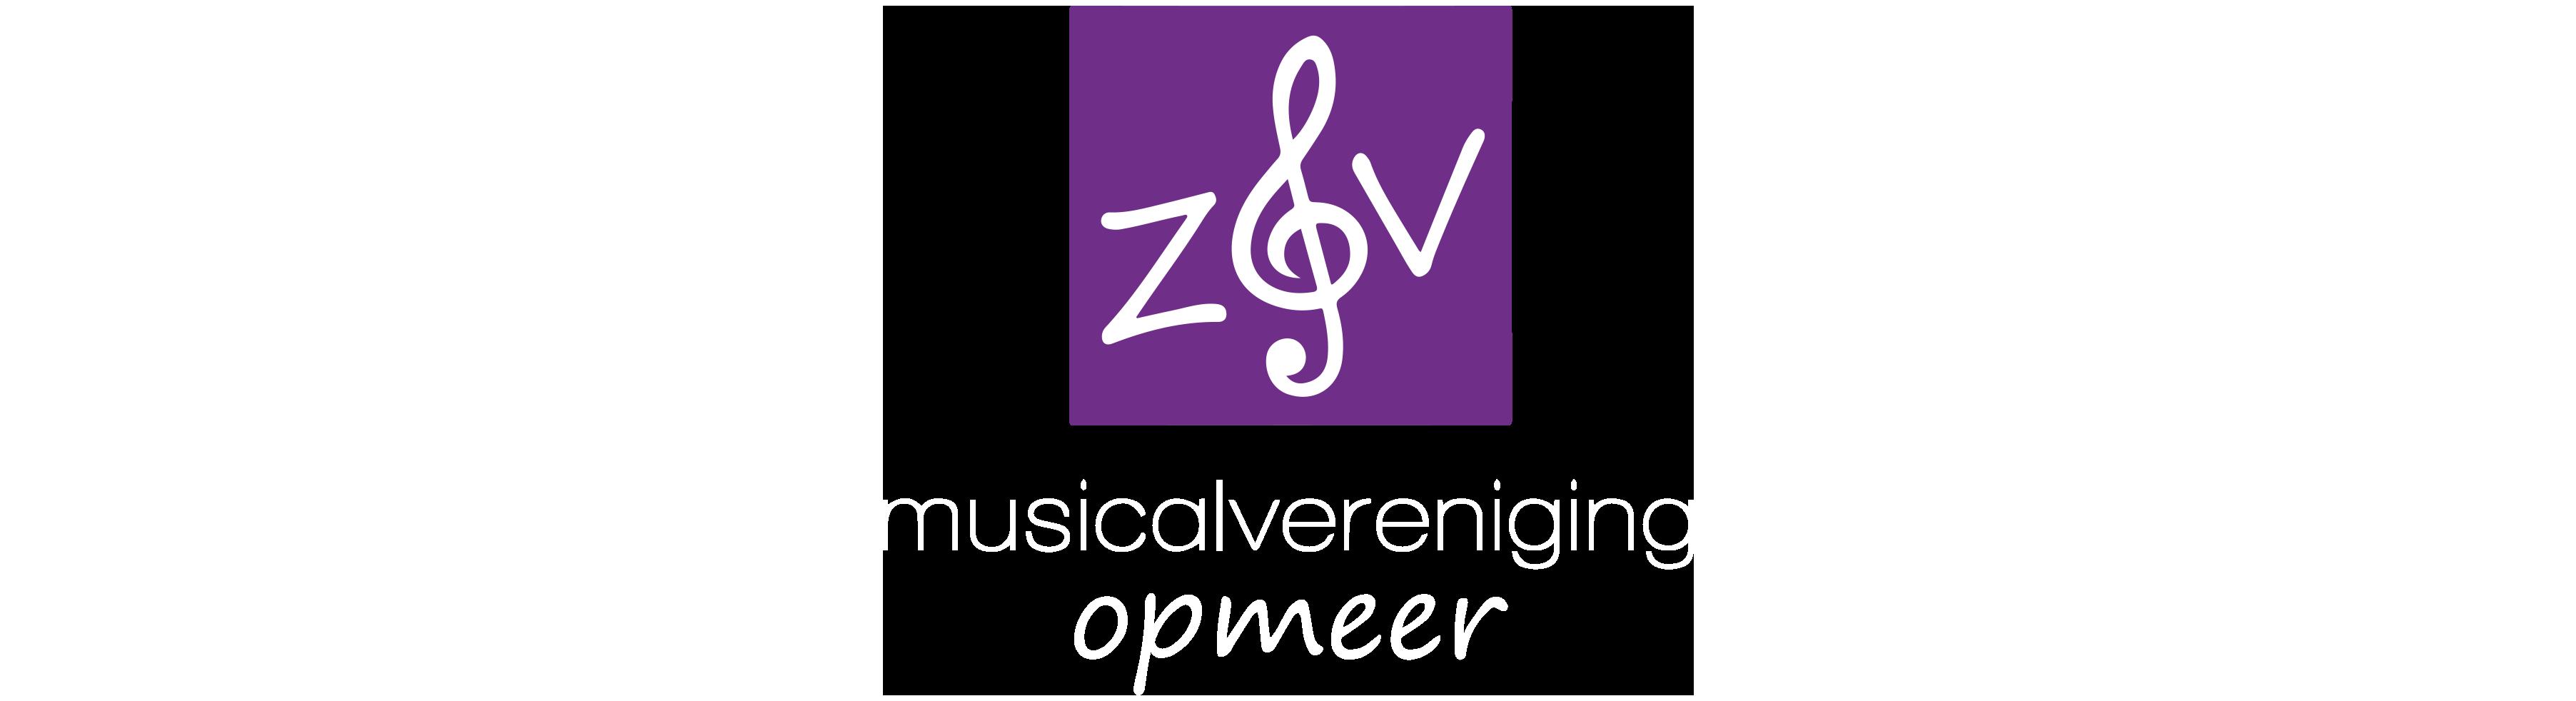 Musicalvereniging Z&V